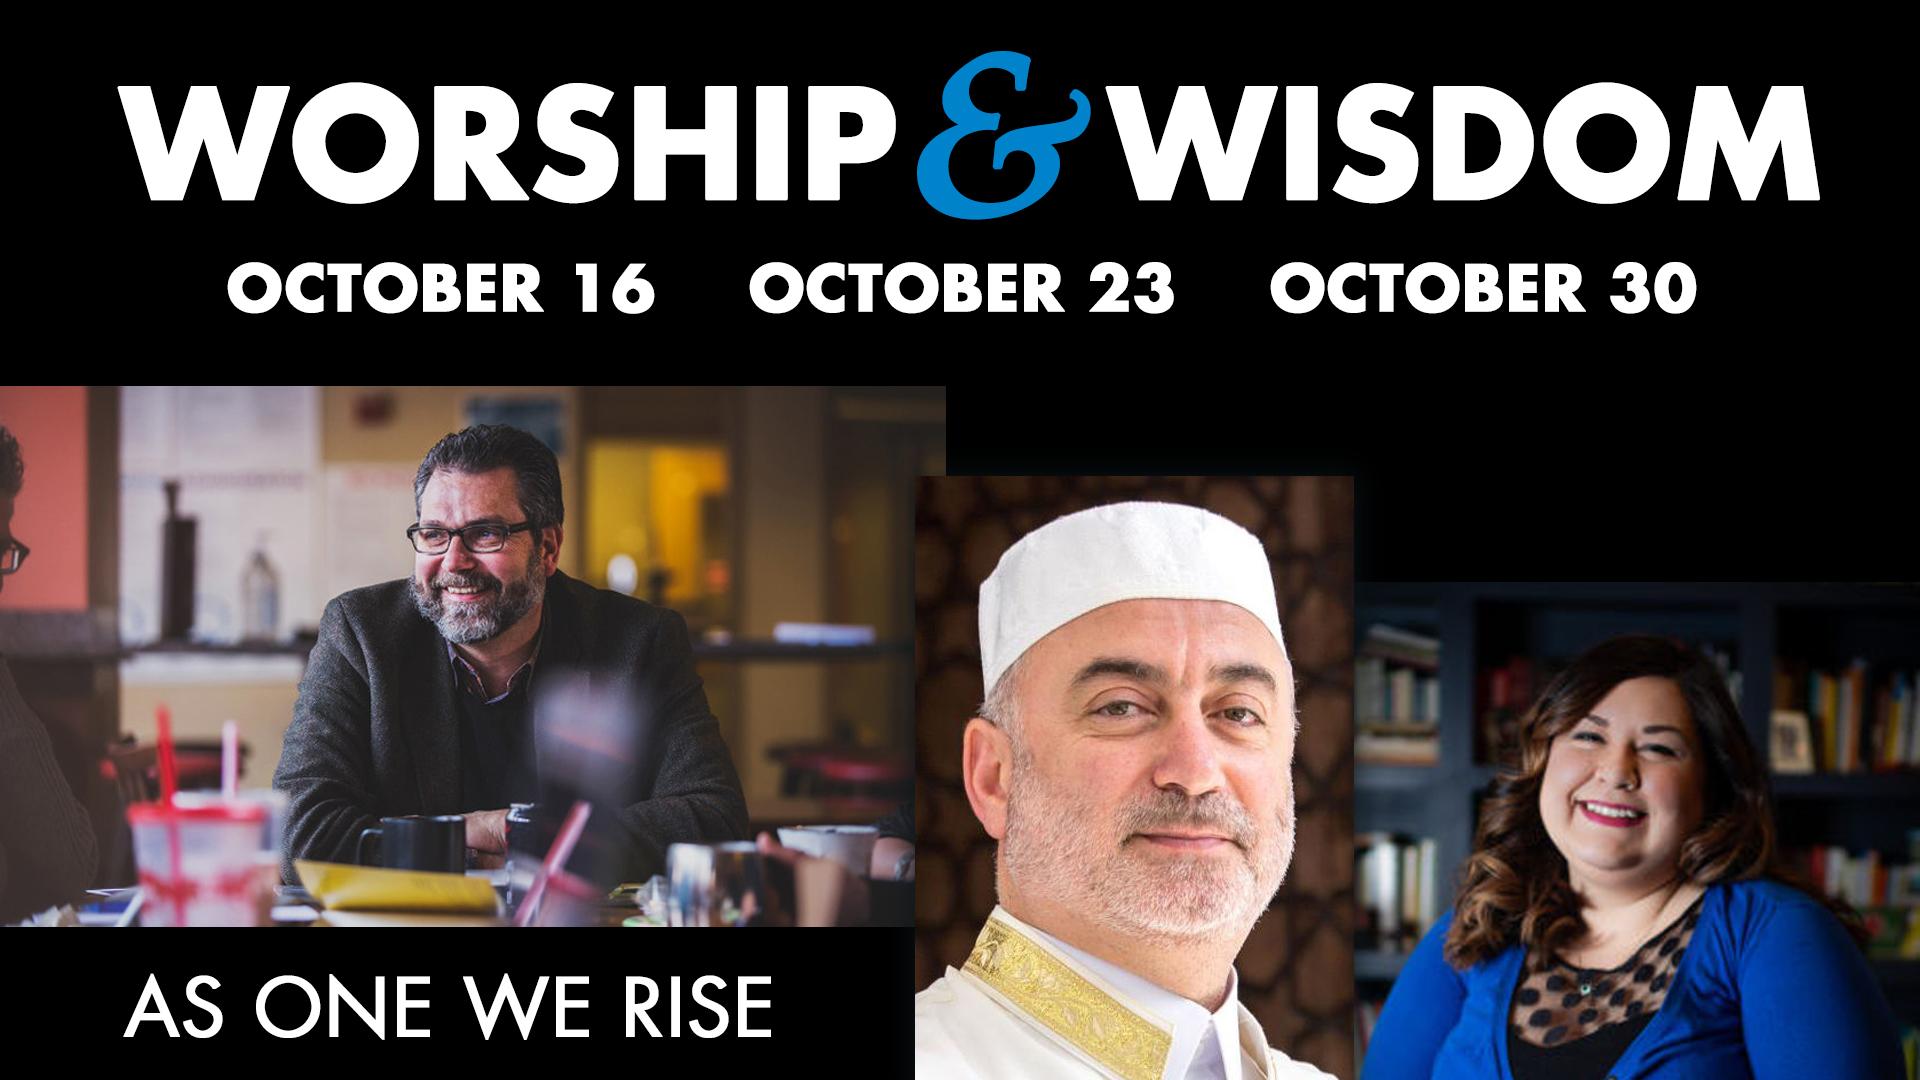 Worship & Wisdom